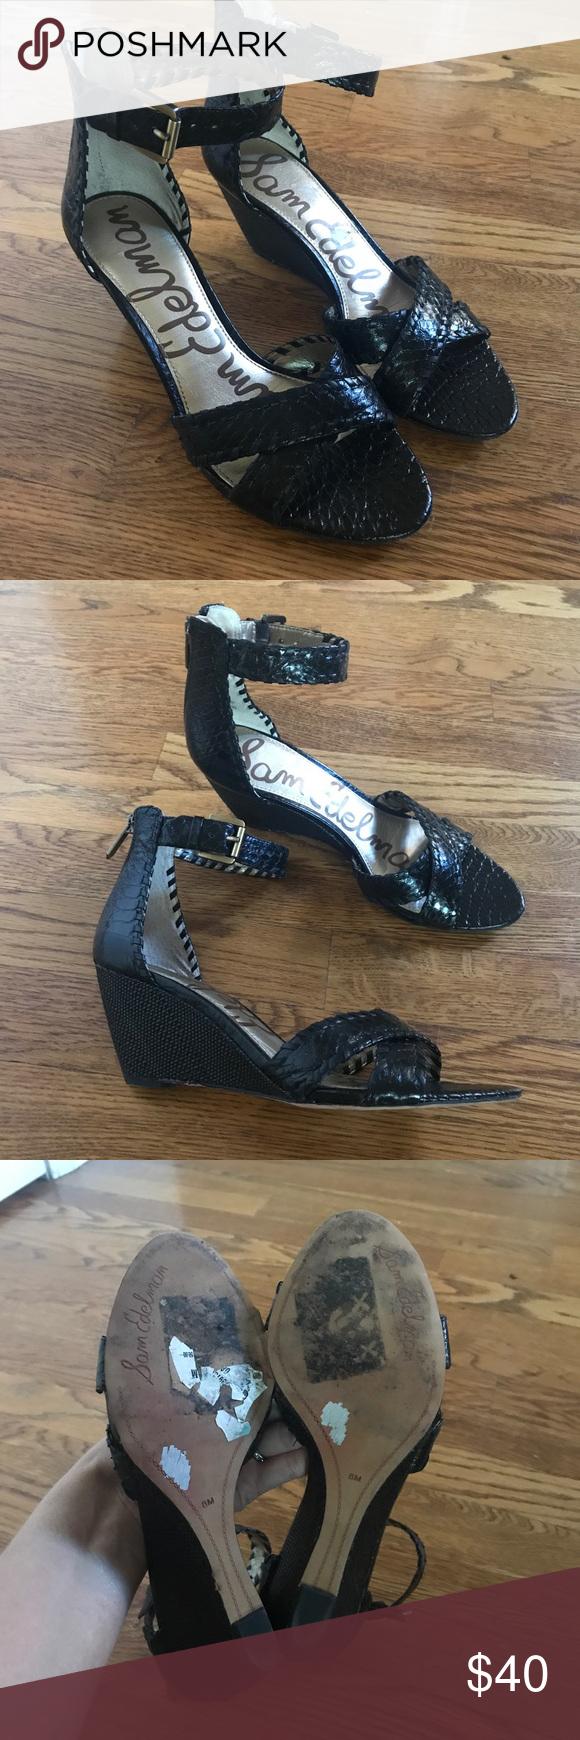 52c1502d869440 Sam Edelman Silvia wedge ankle strap heels size 8